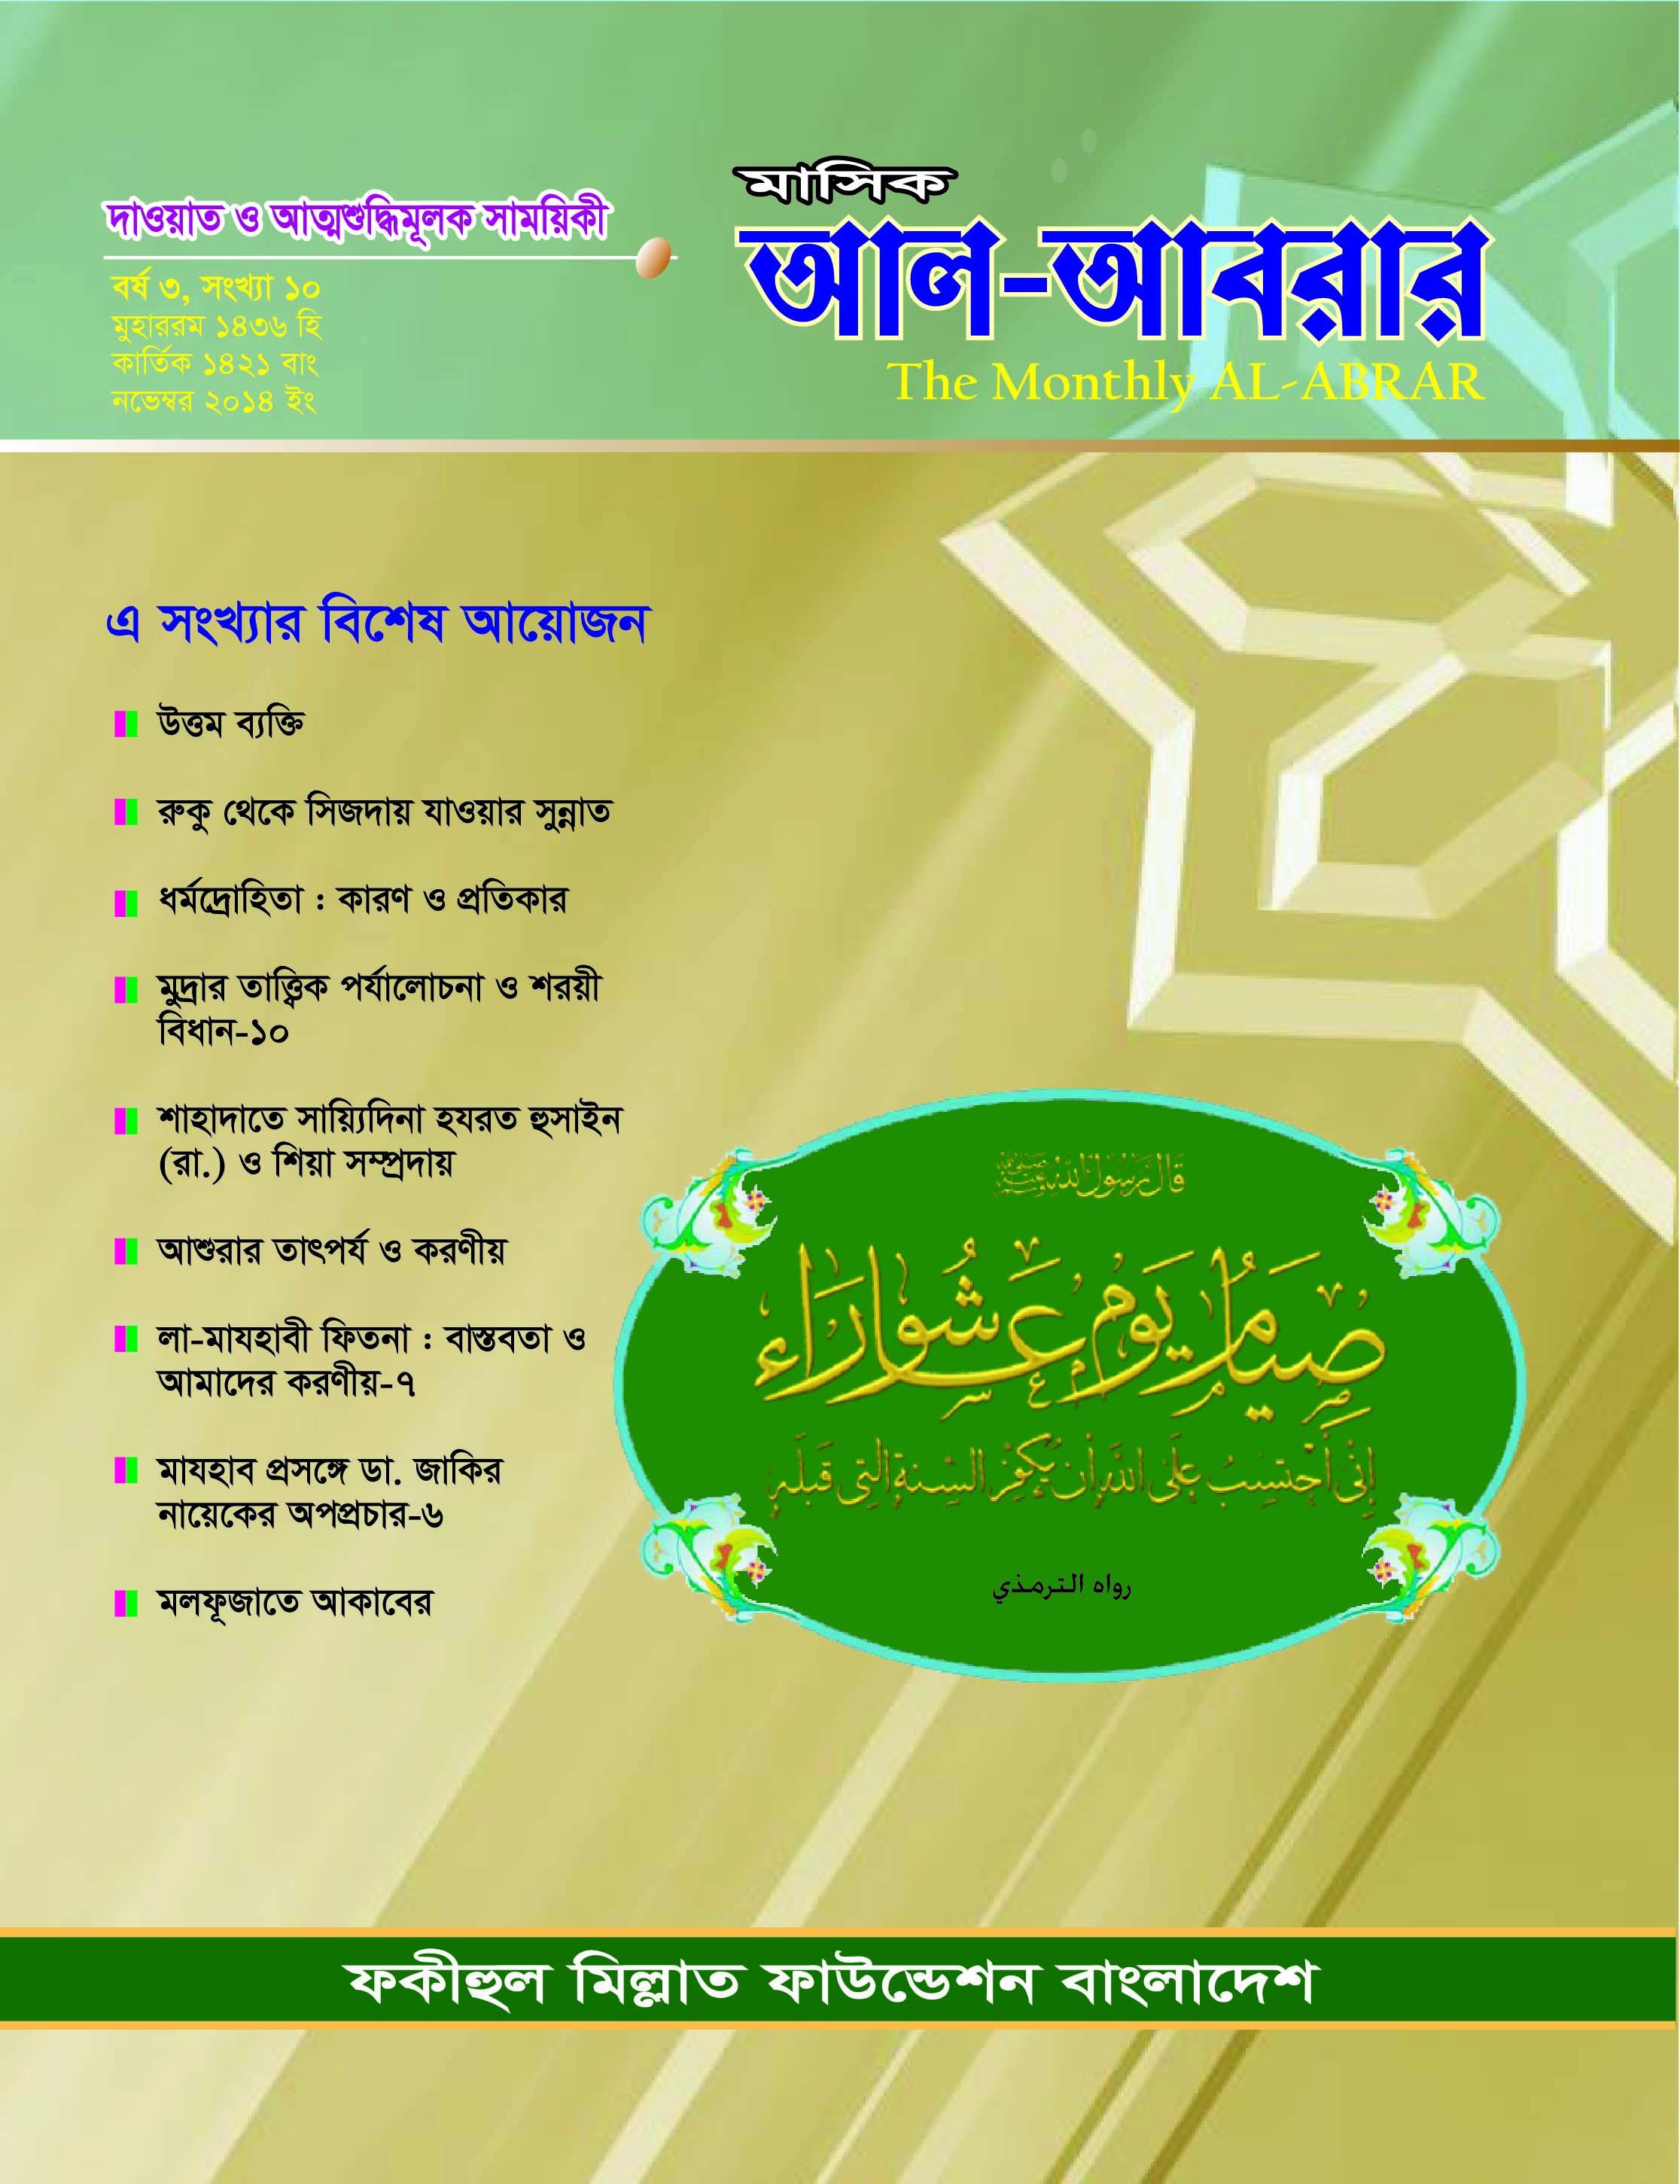 Cover Finel 11-2014-Fainal2 copy